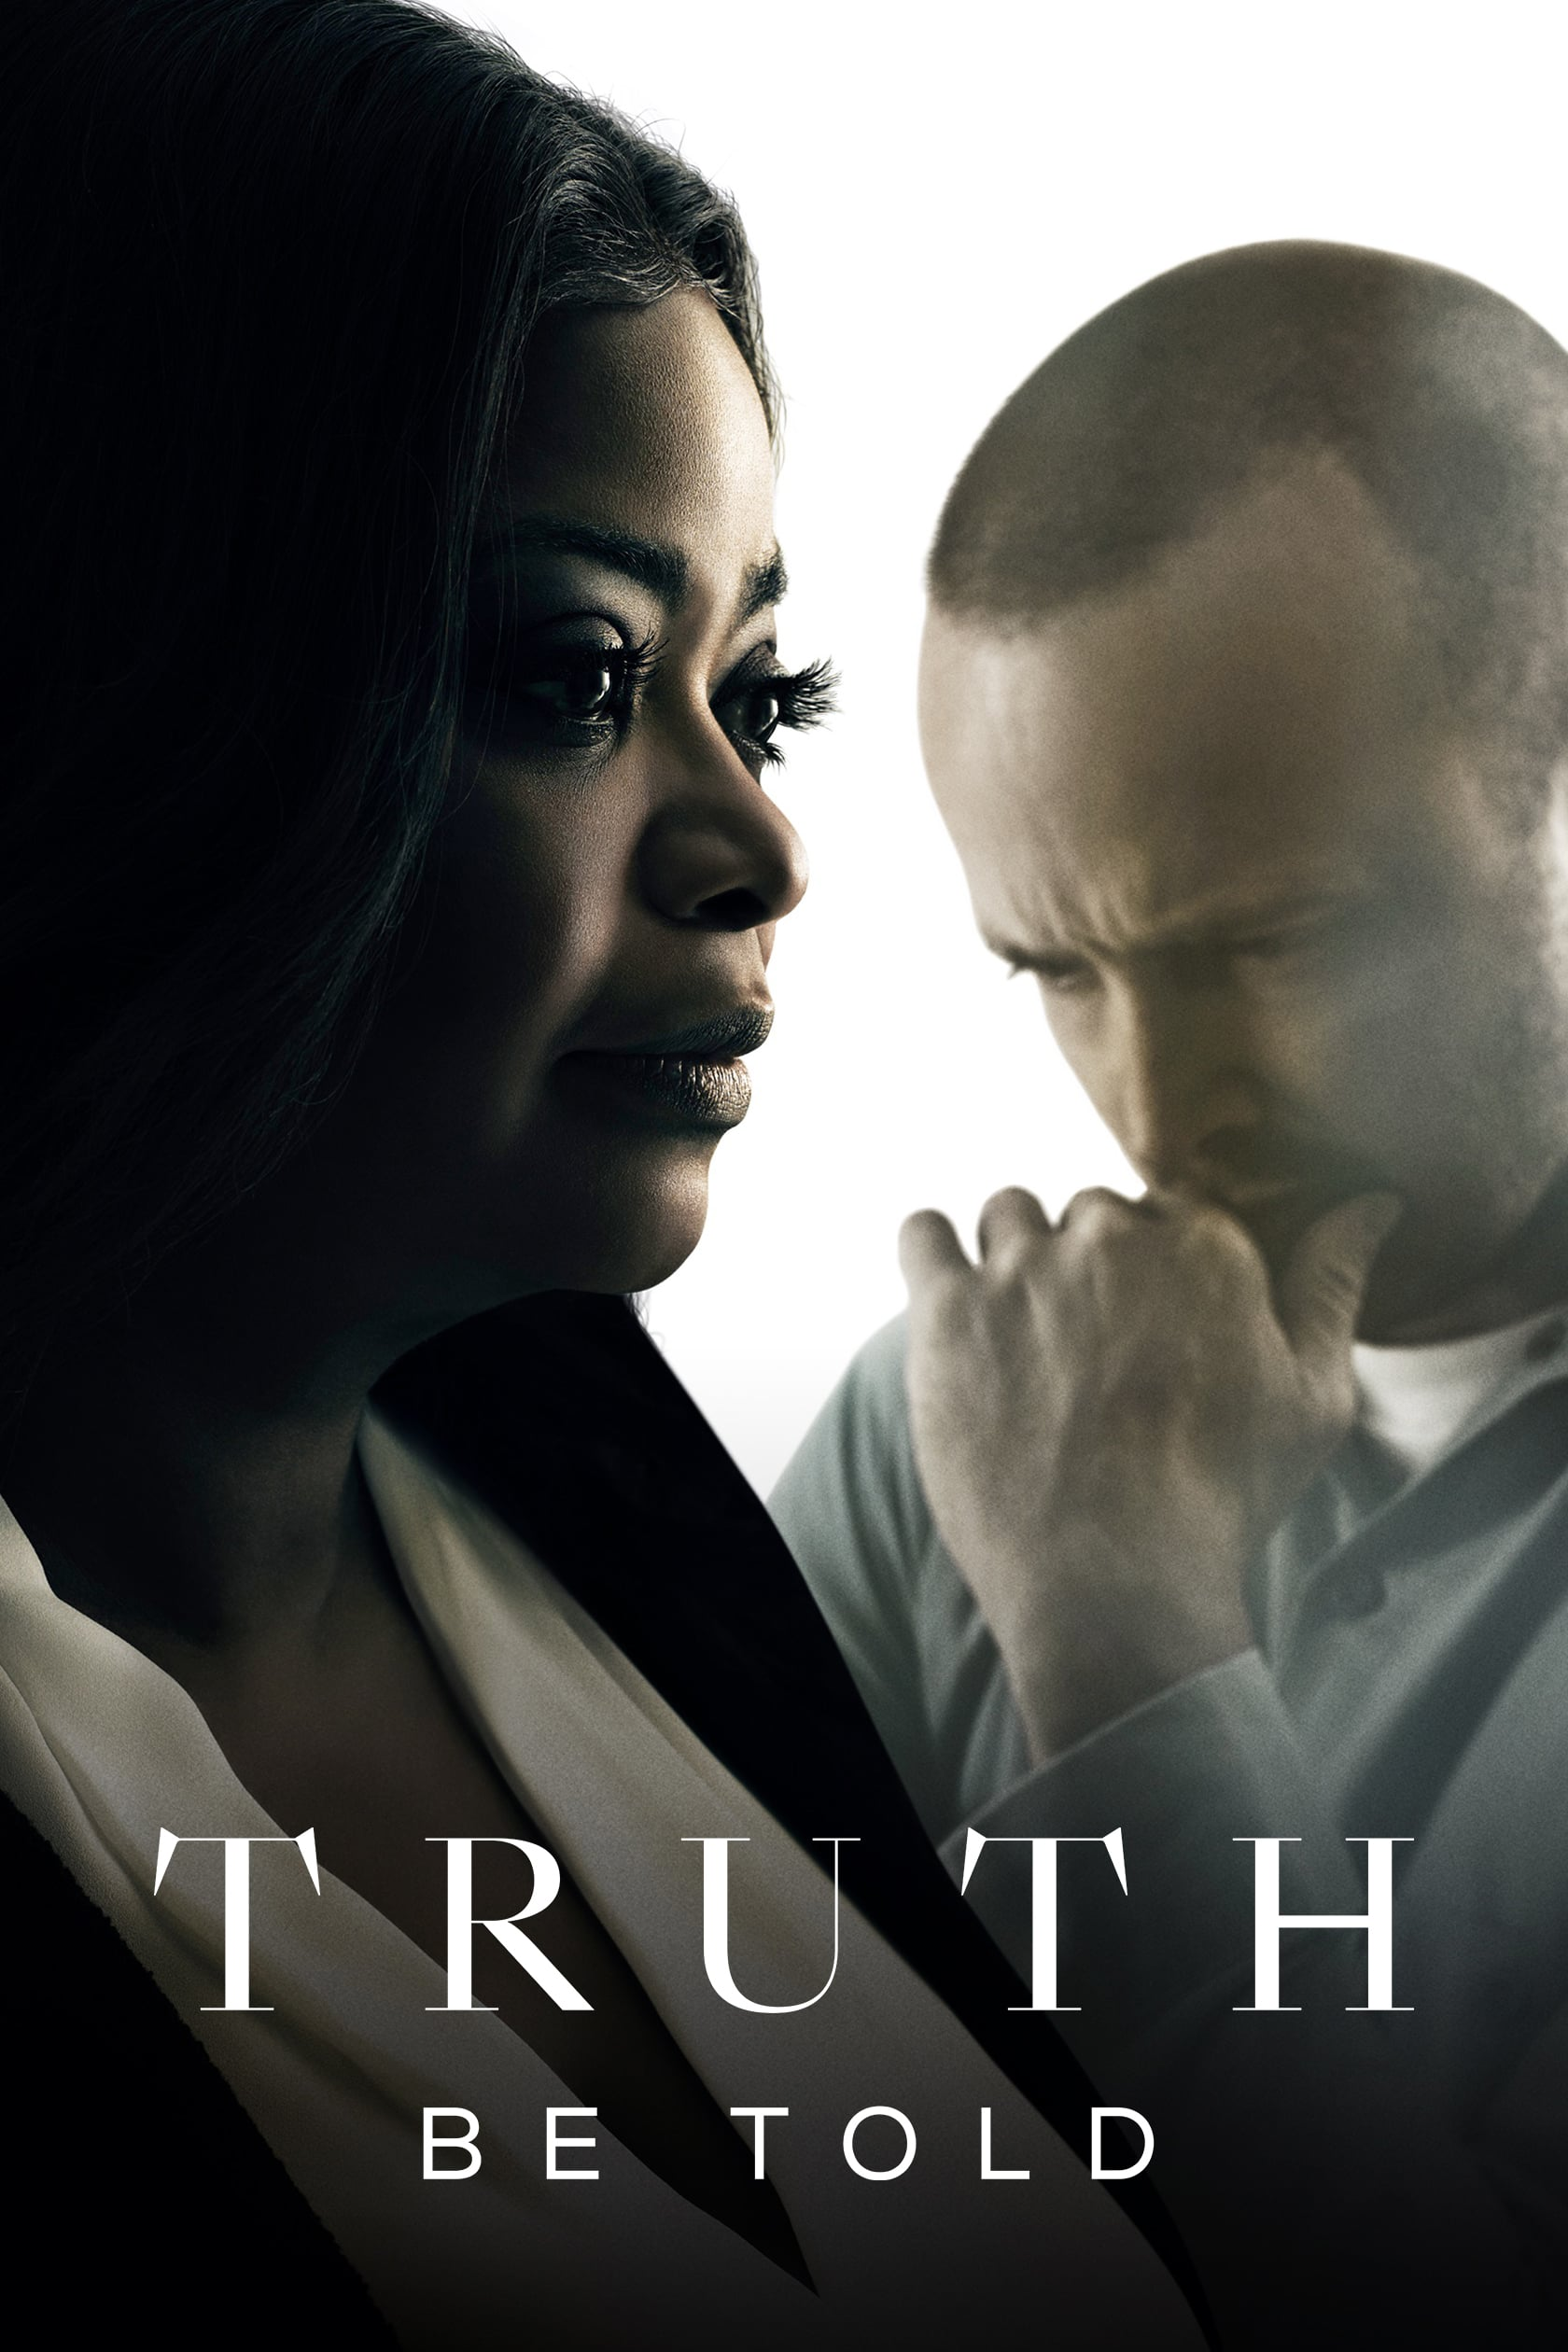 Truth Be Told (TV Series 2019– ) - IMDb